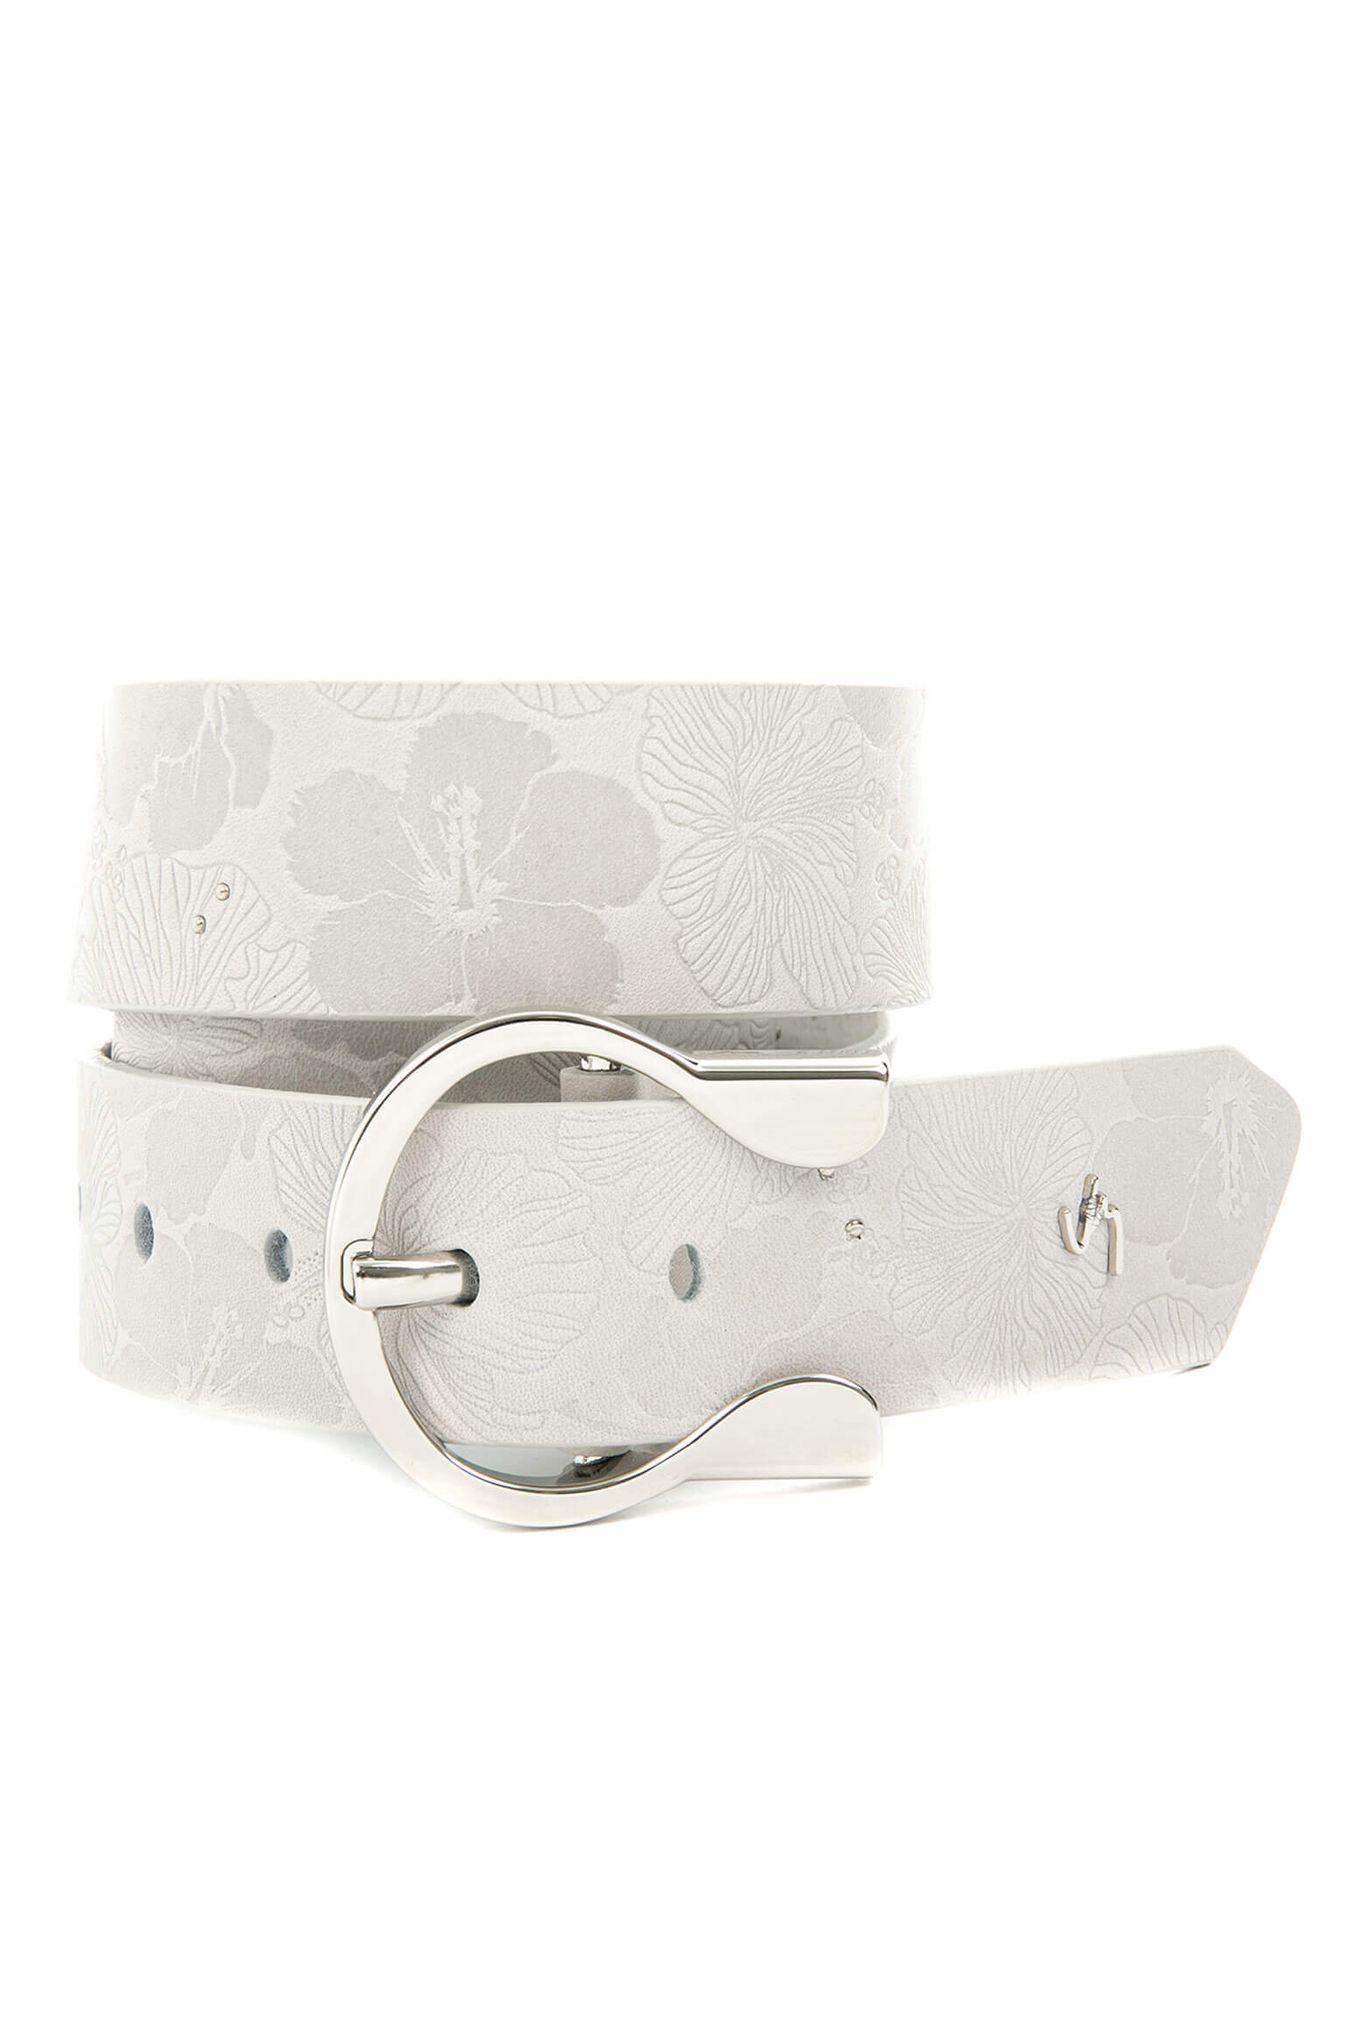 62b8d68f2 Cinturón unifaz de cuero para mujer 18750 | Unifaz | Vélez - Velez-18